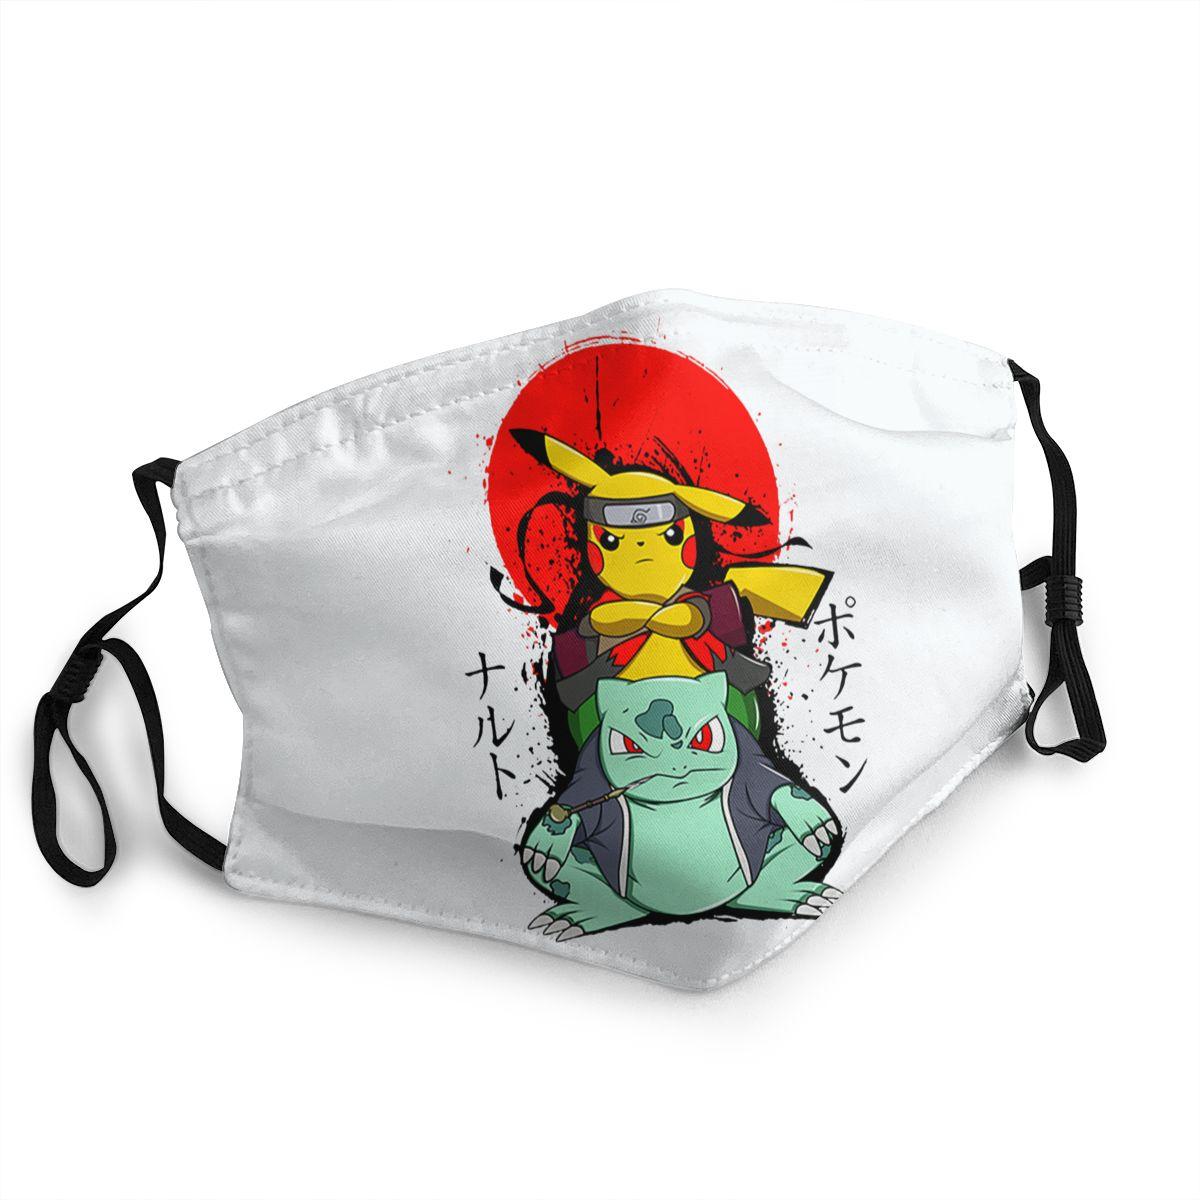 Pikachu Bulbasaur Naruto Pokemon Non-Disposable Mouth Face Mask Anti Haze Dustproof Mask Protection Cover Respirator Muffle